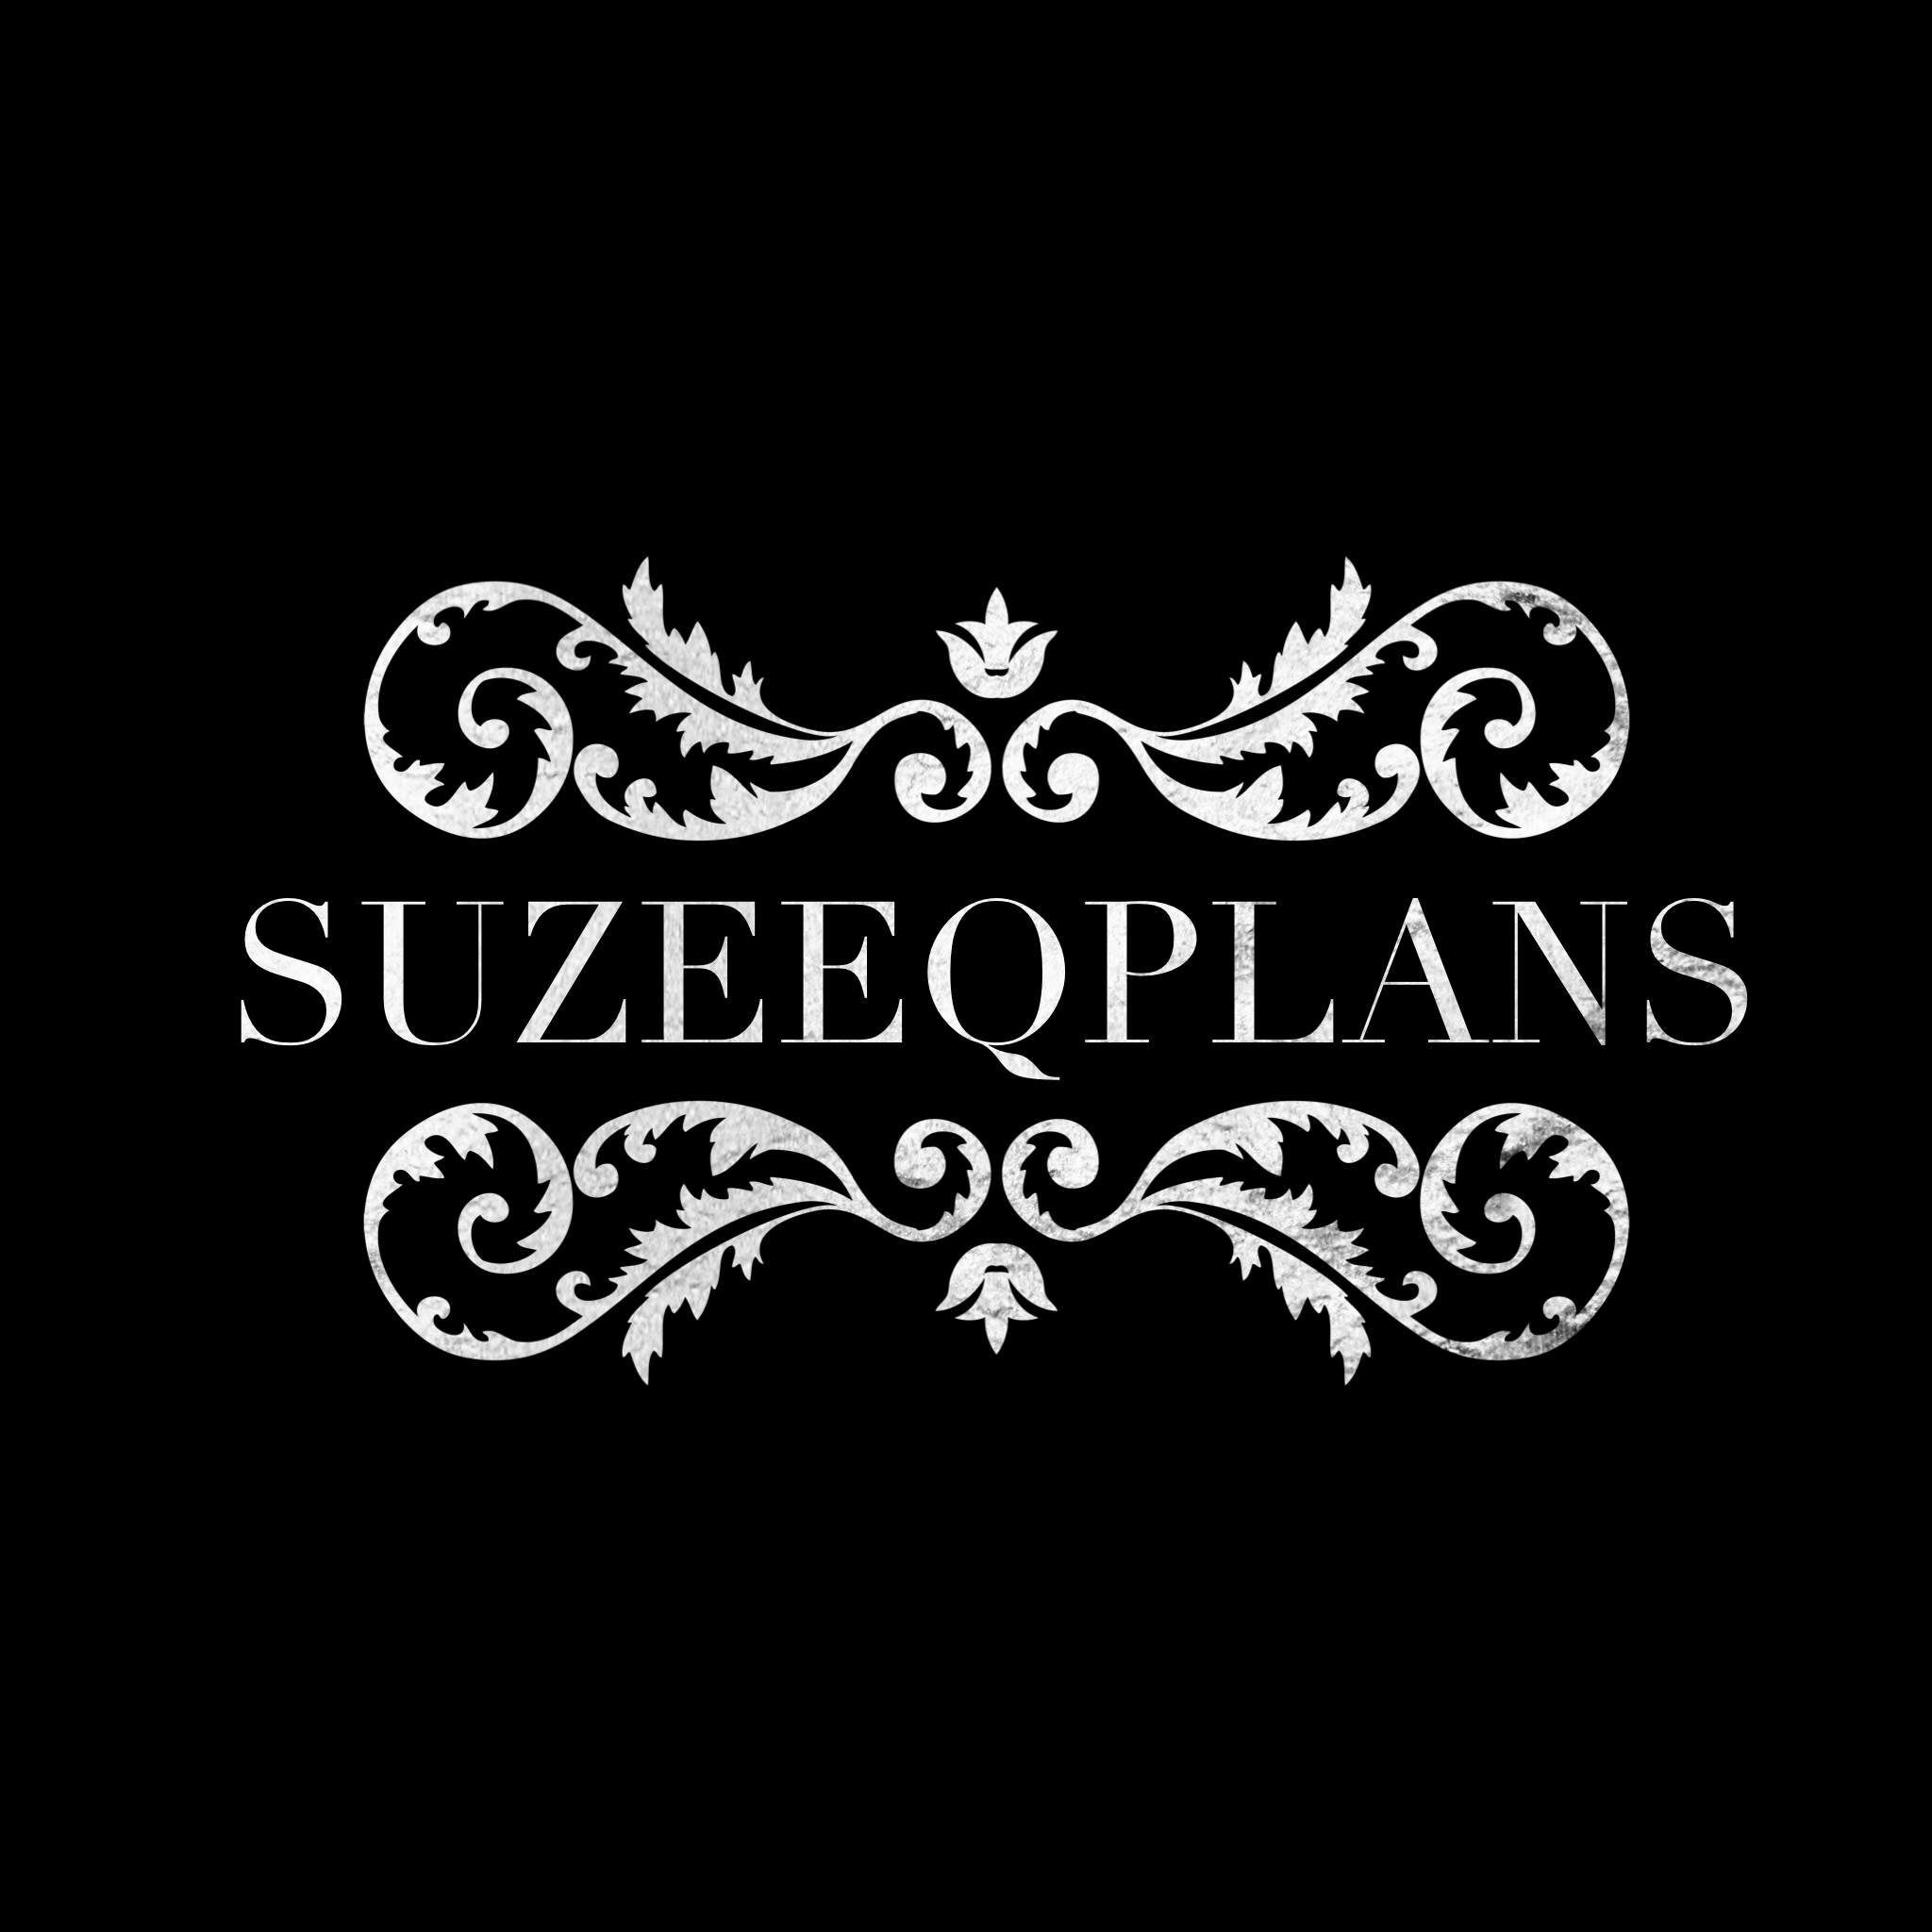 SuzeeQPlans.png